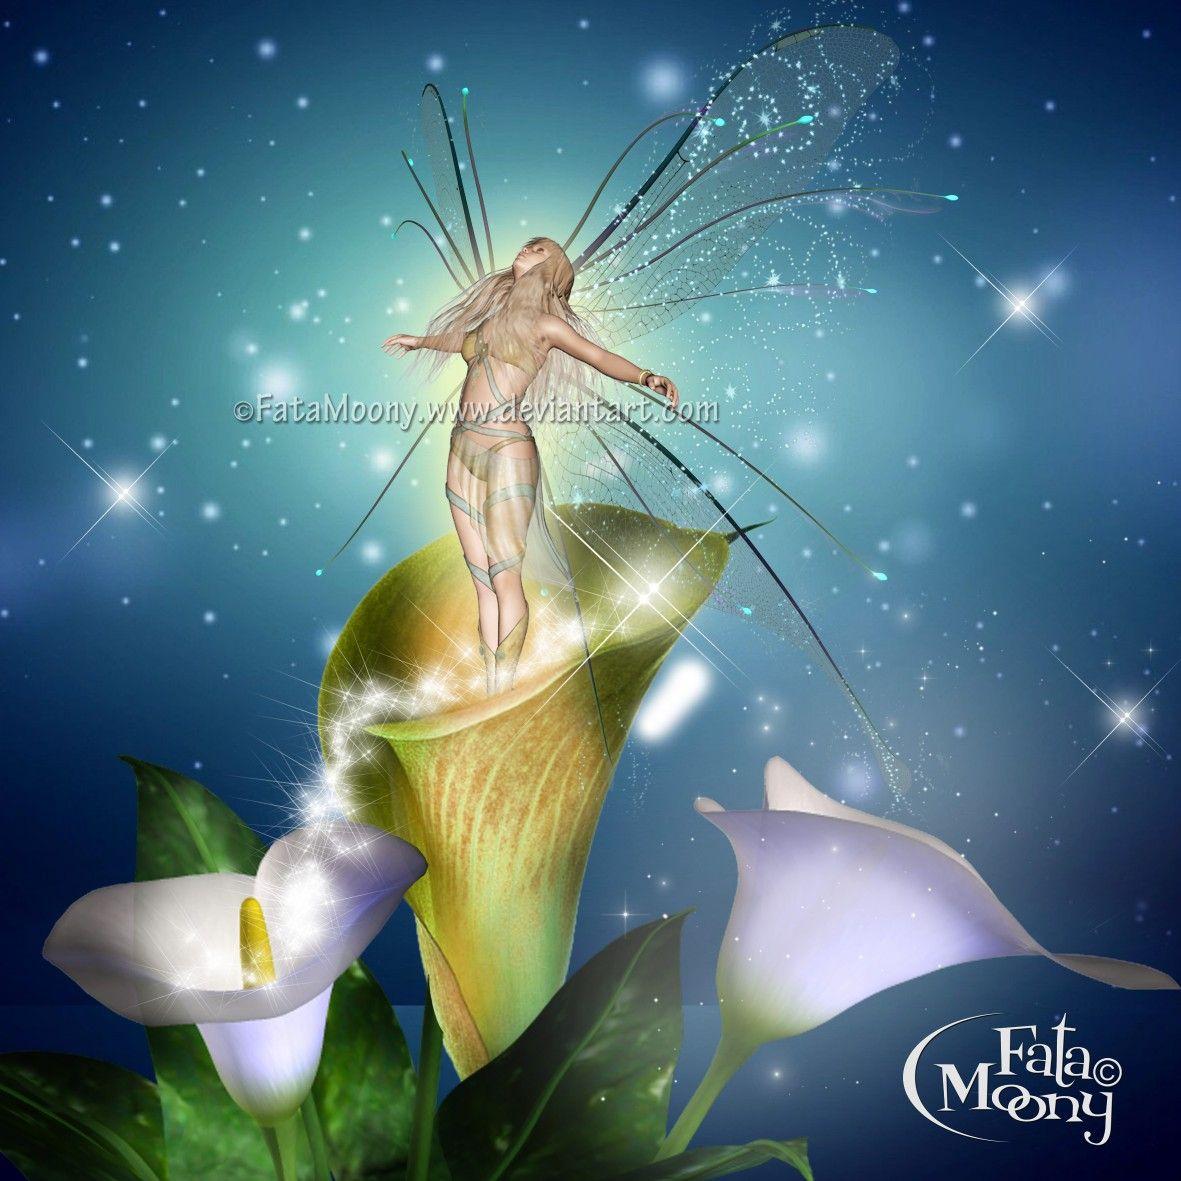 Kissing Wisteria Faeries/Fairies Fantasy Art 11x14 Poster